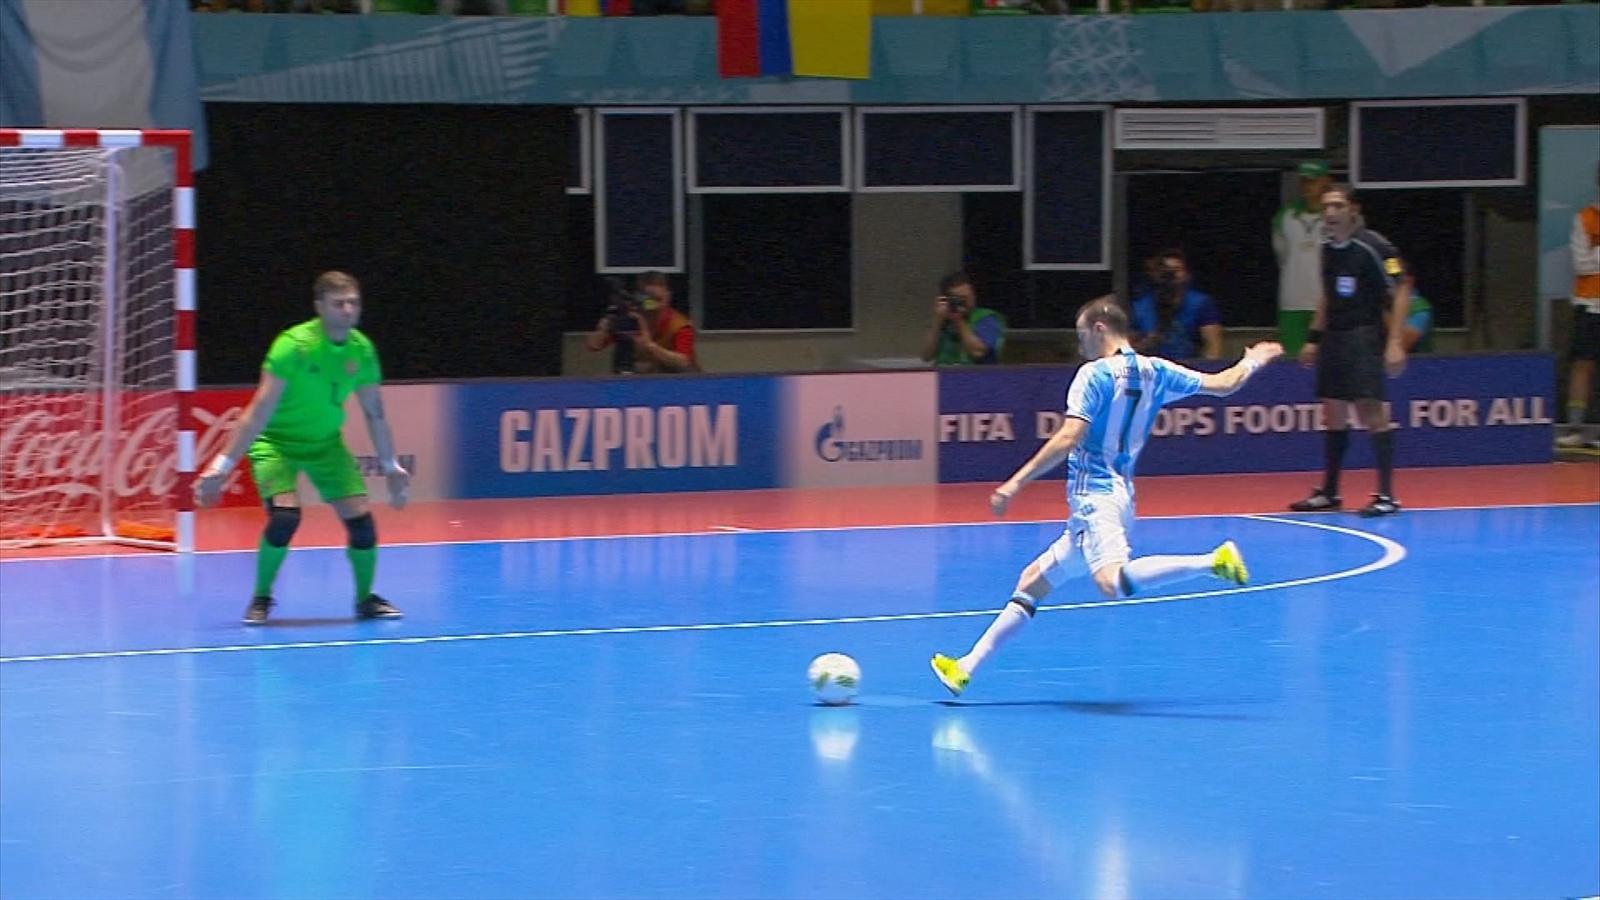 VIDEO - Argentina overcome Russia to claim Futsal World Cup - Video Eurosport